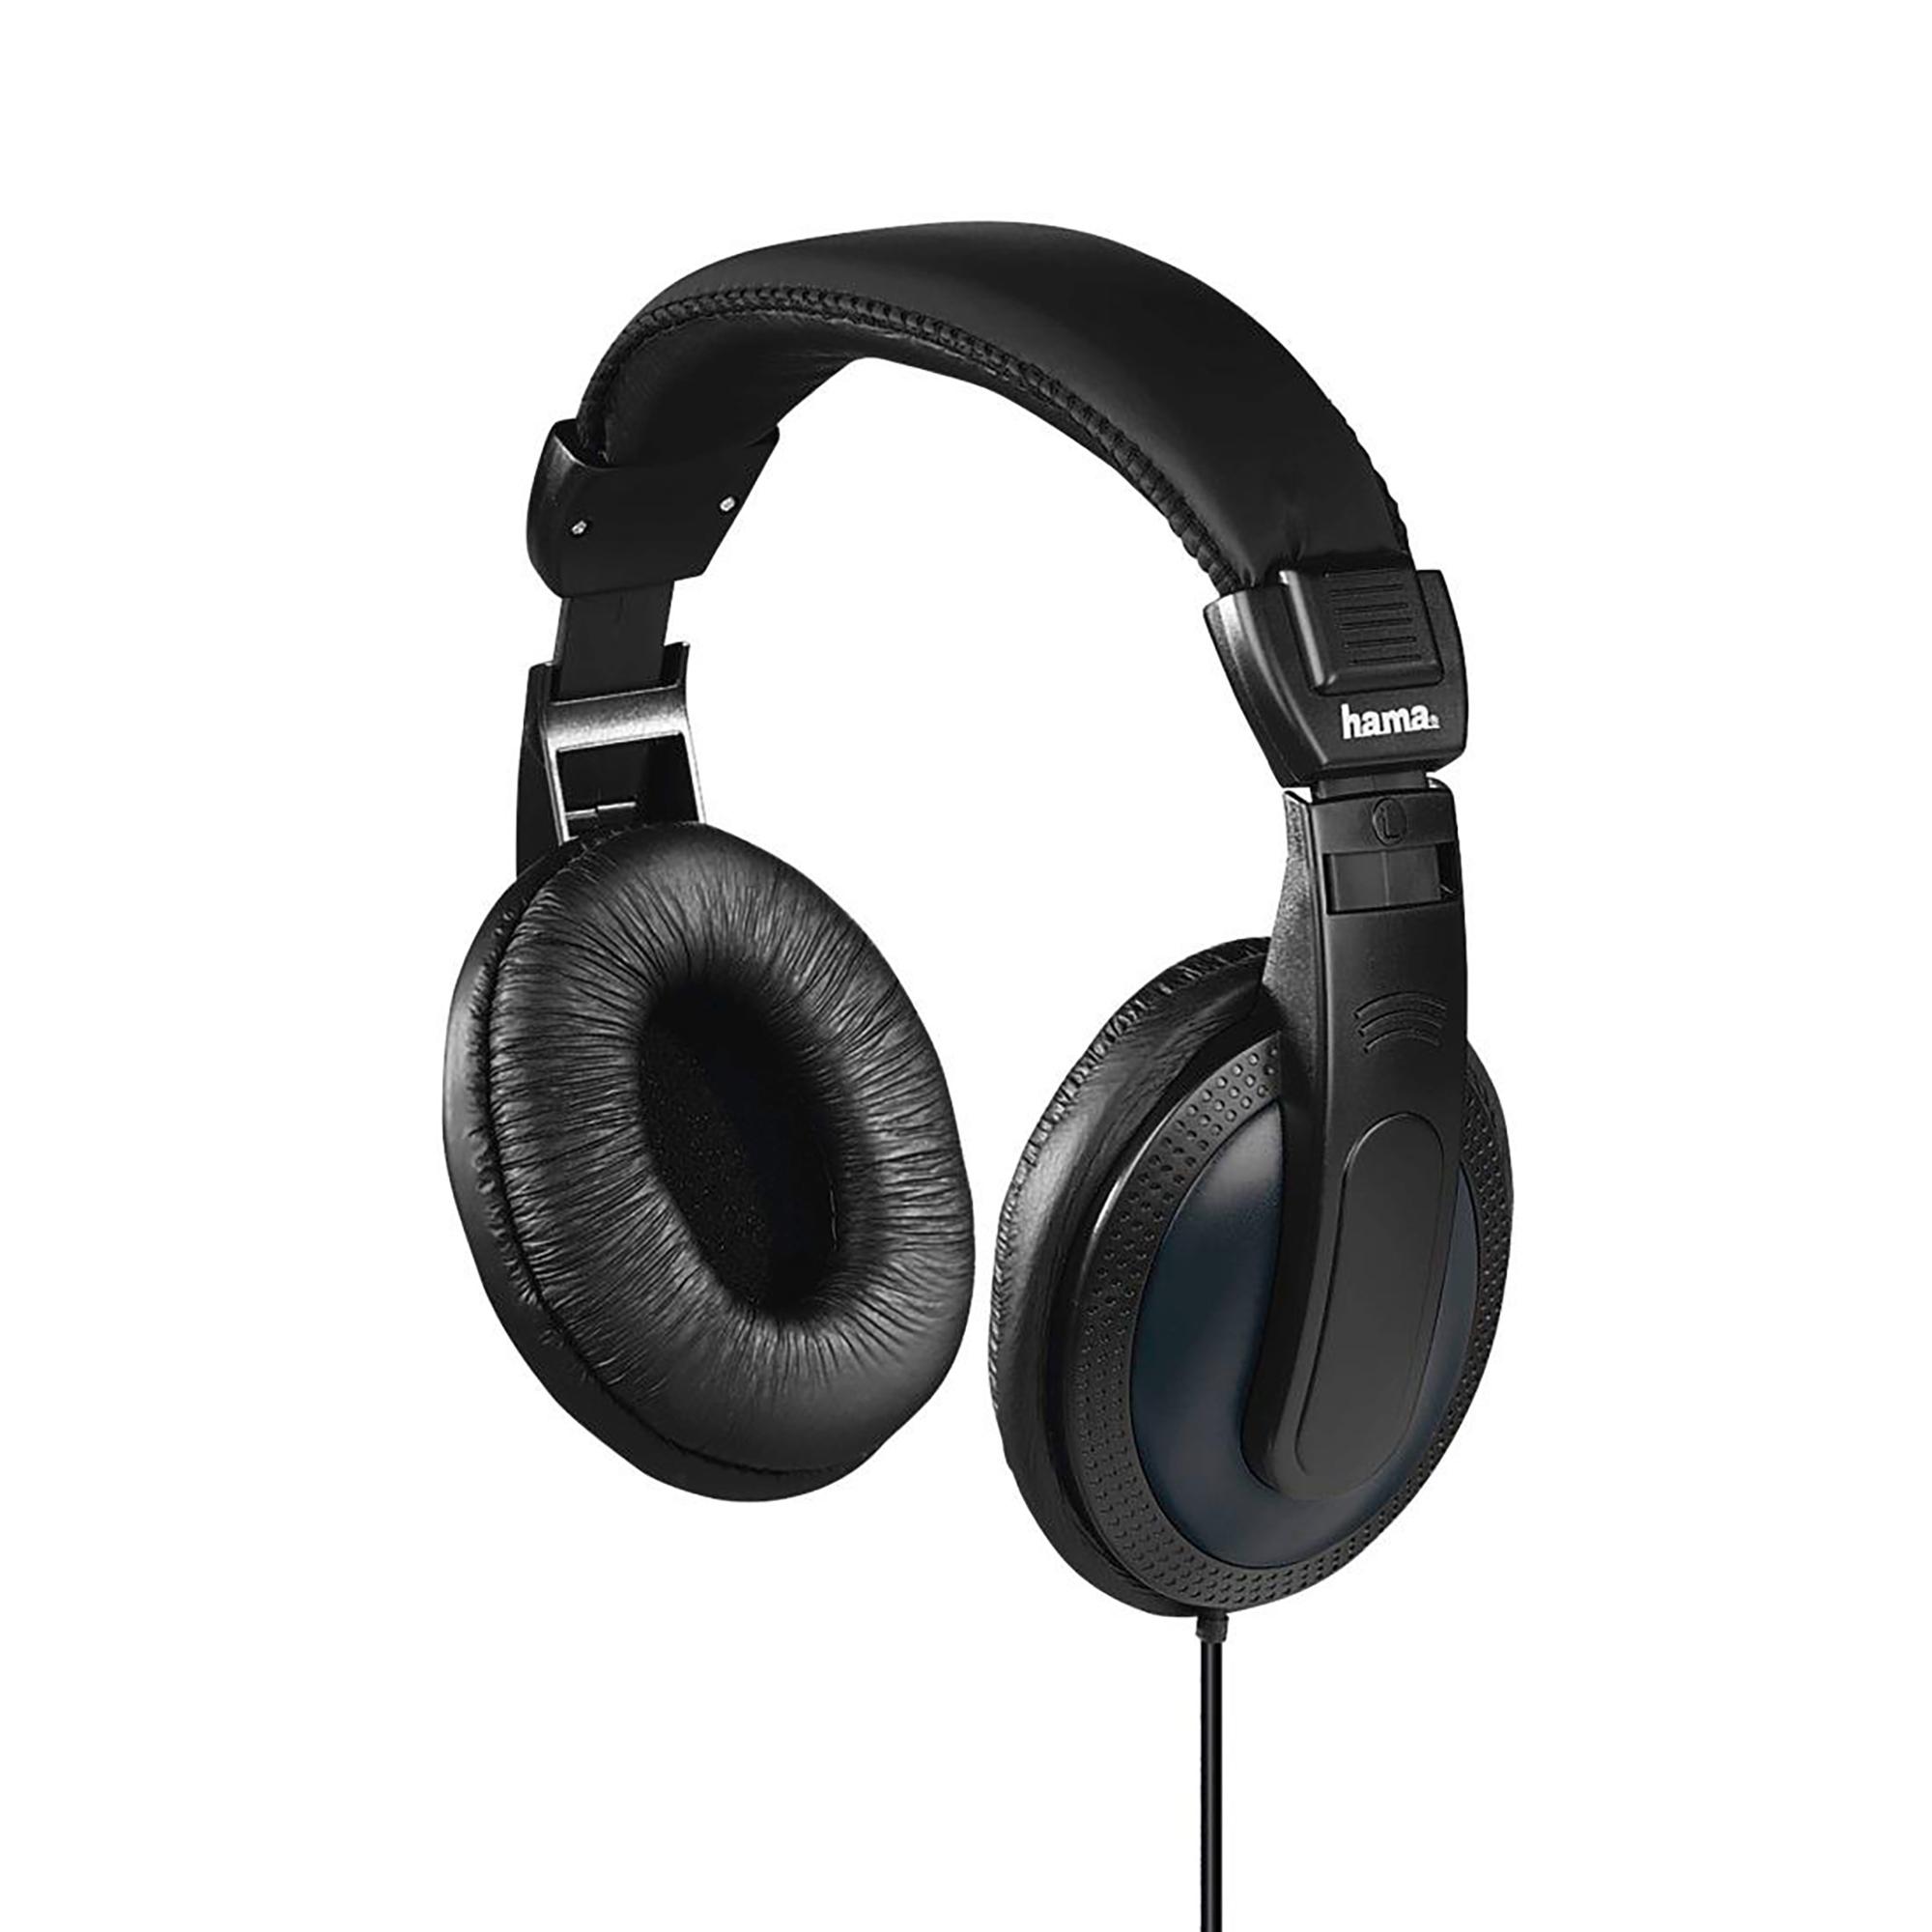 Hama Headphones Padded Over-Ear Circumaural Stereo 6m Cable Black Ref 00184013